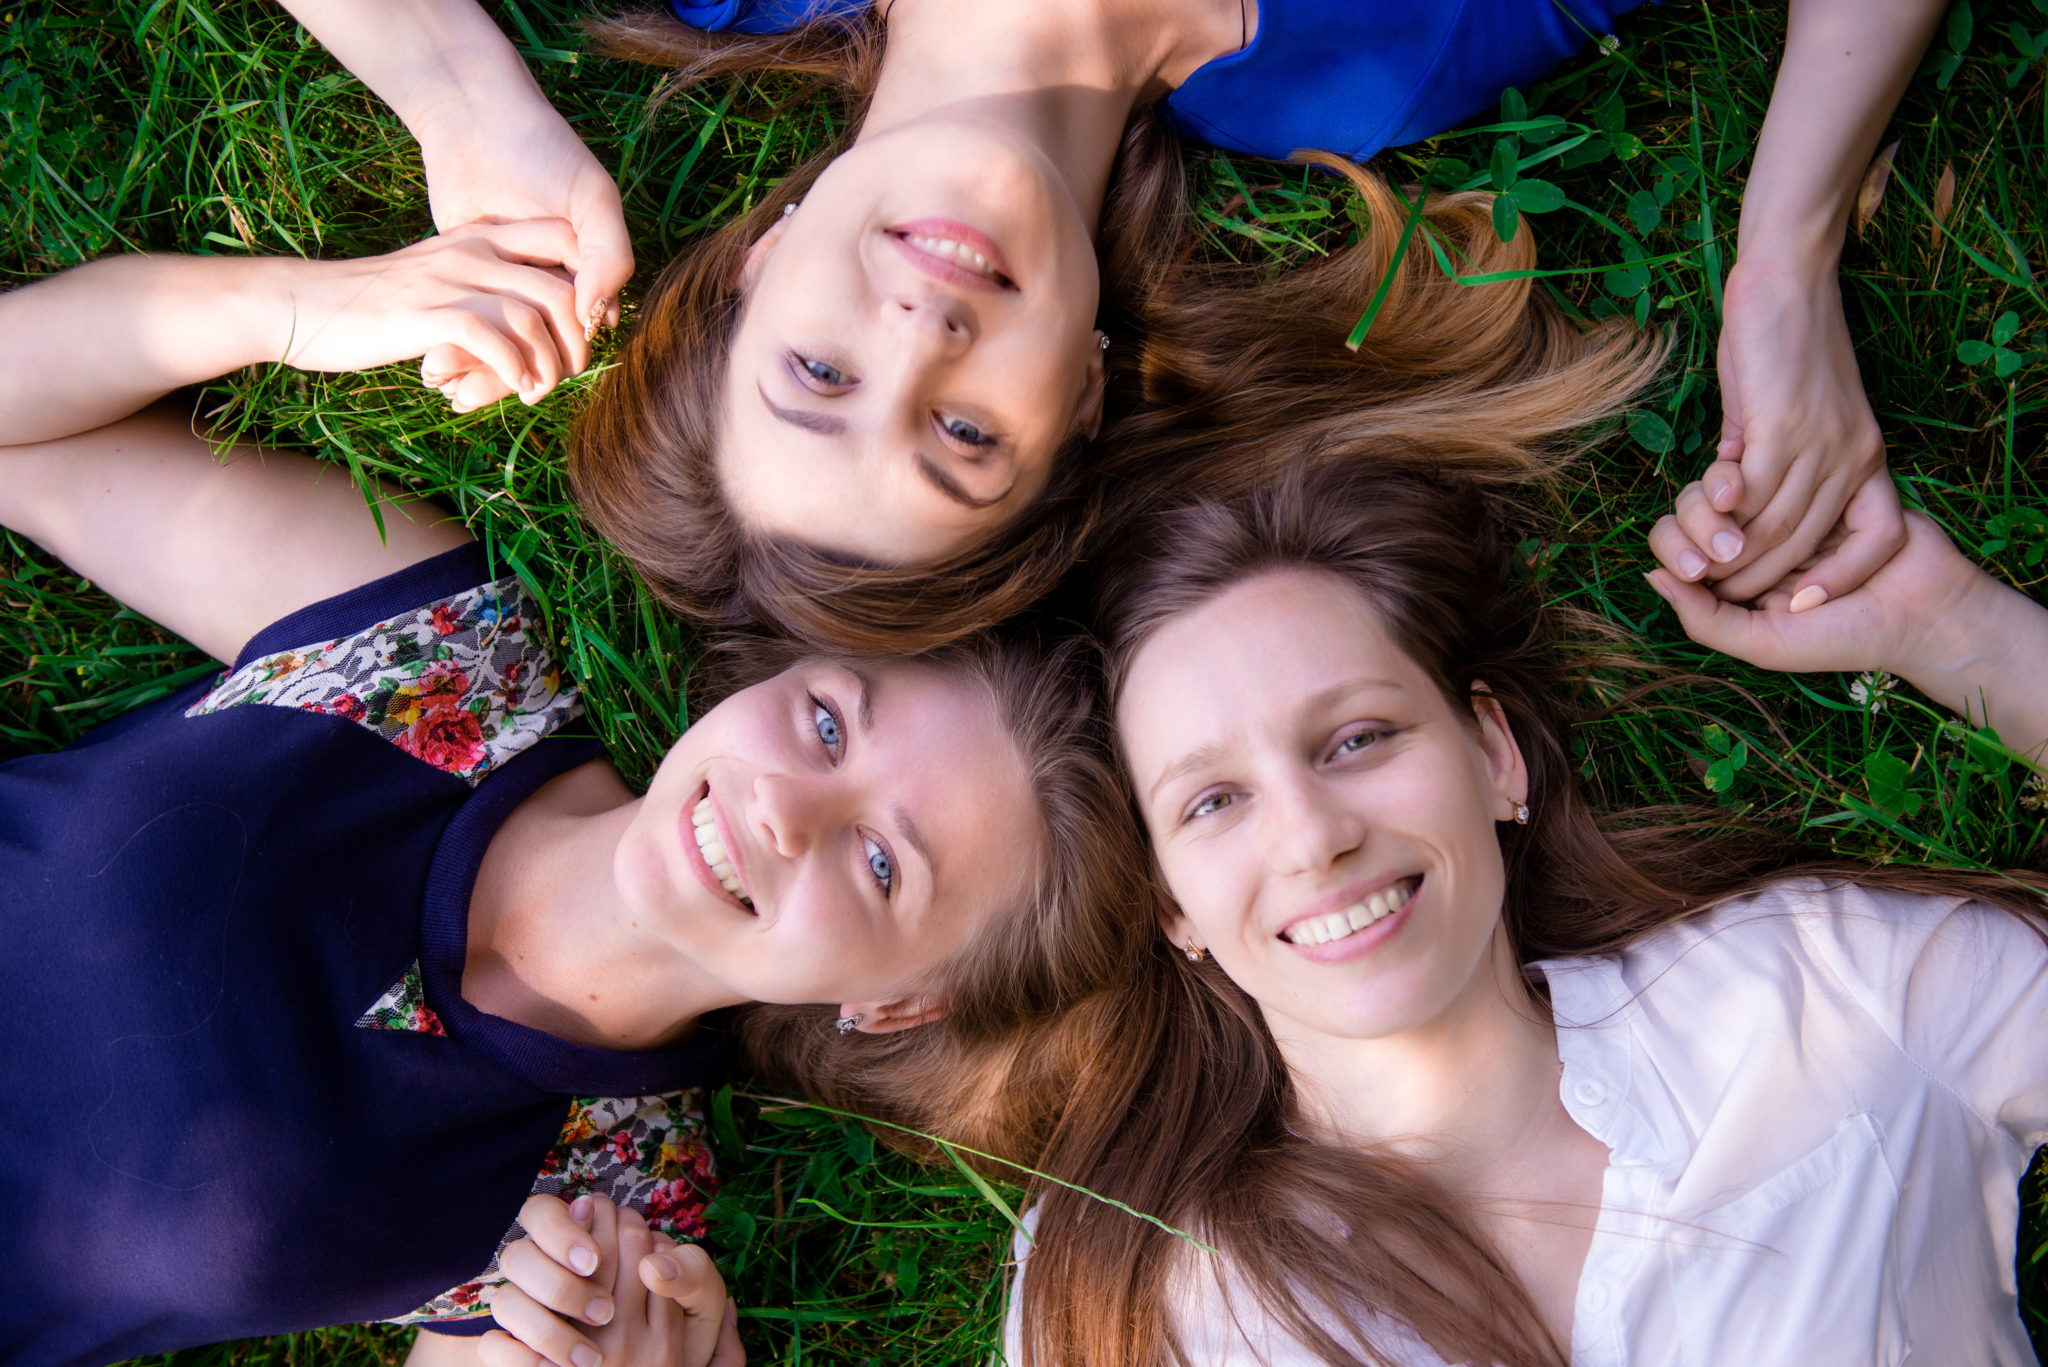 Девичник на природе, 3 девушек в парке